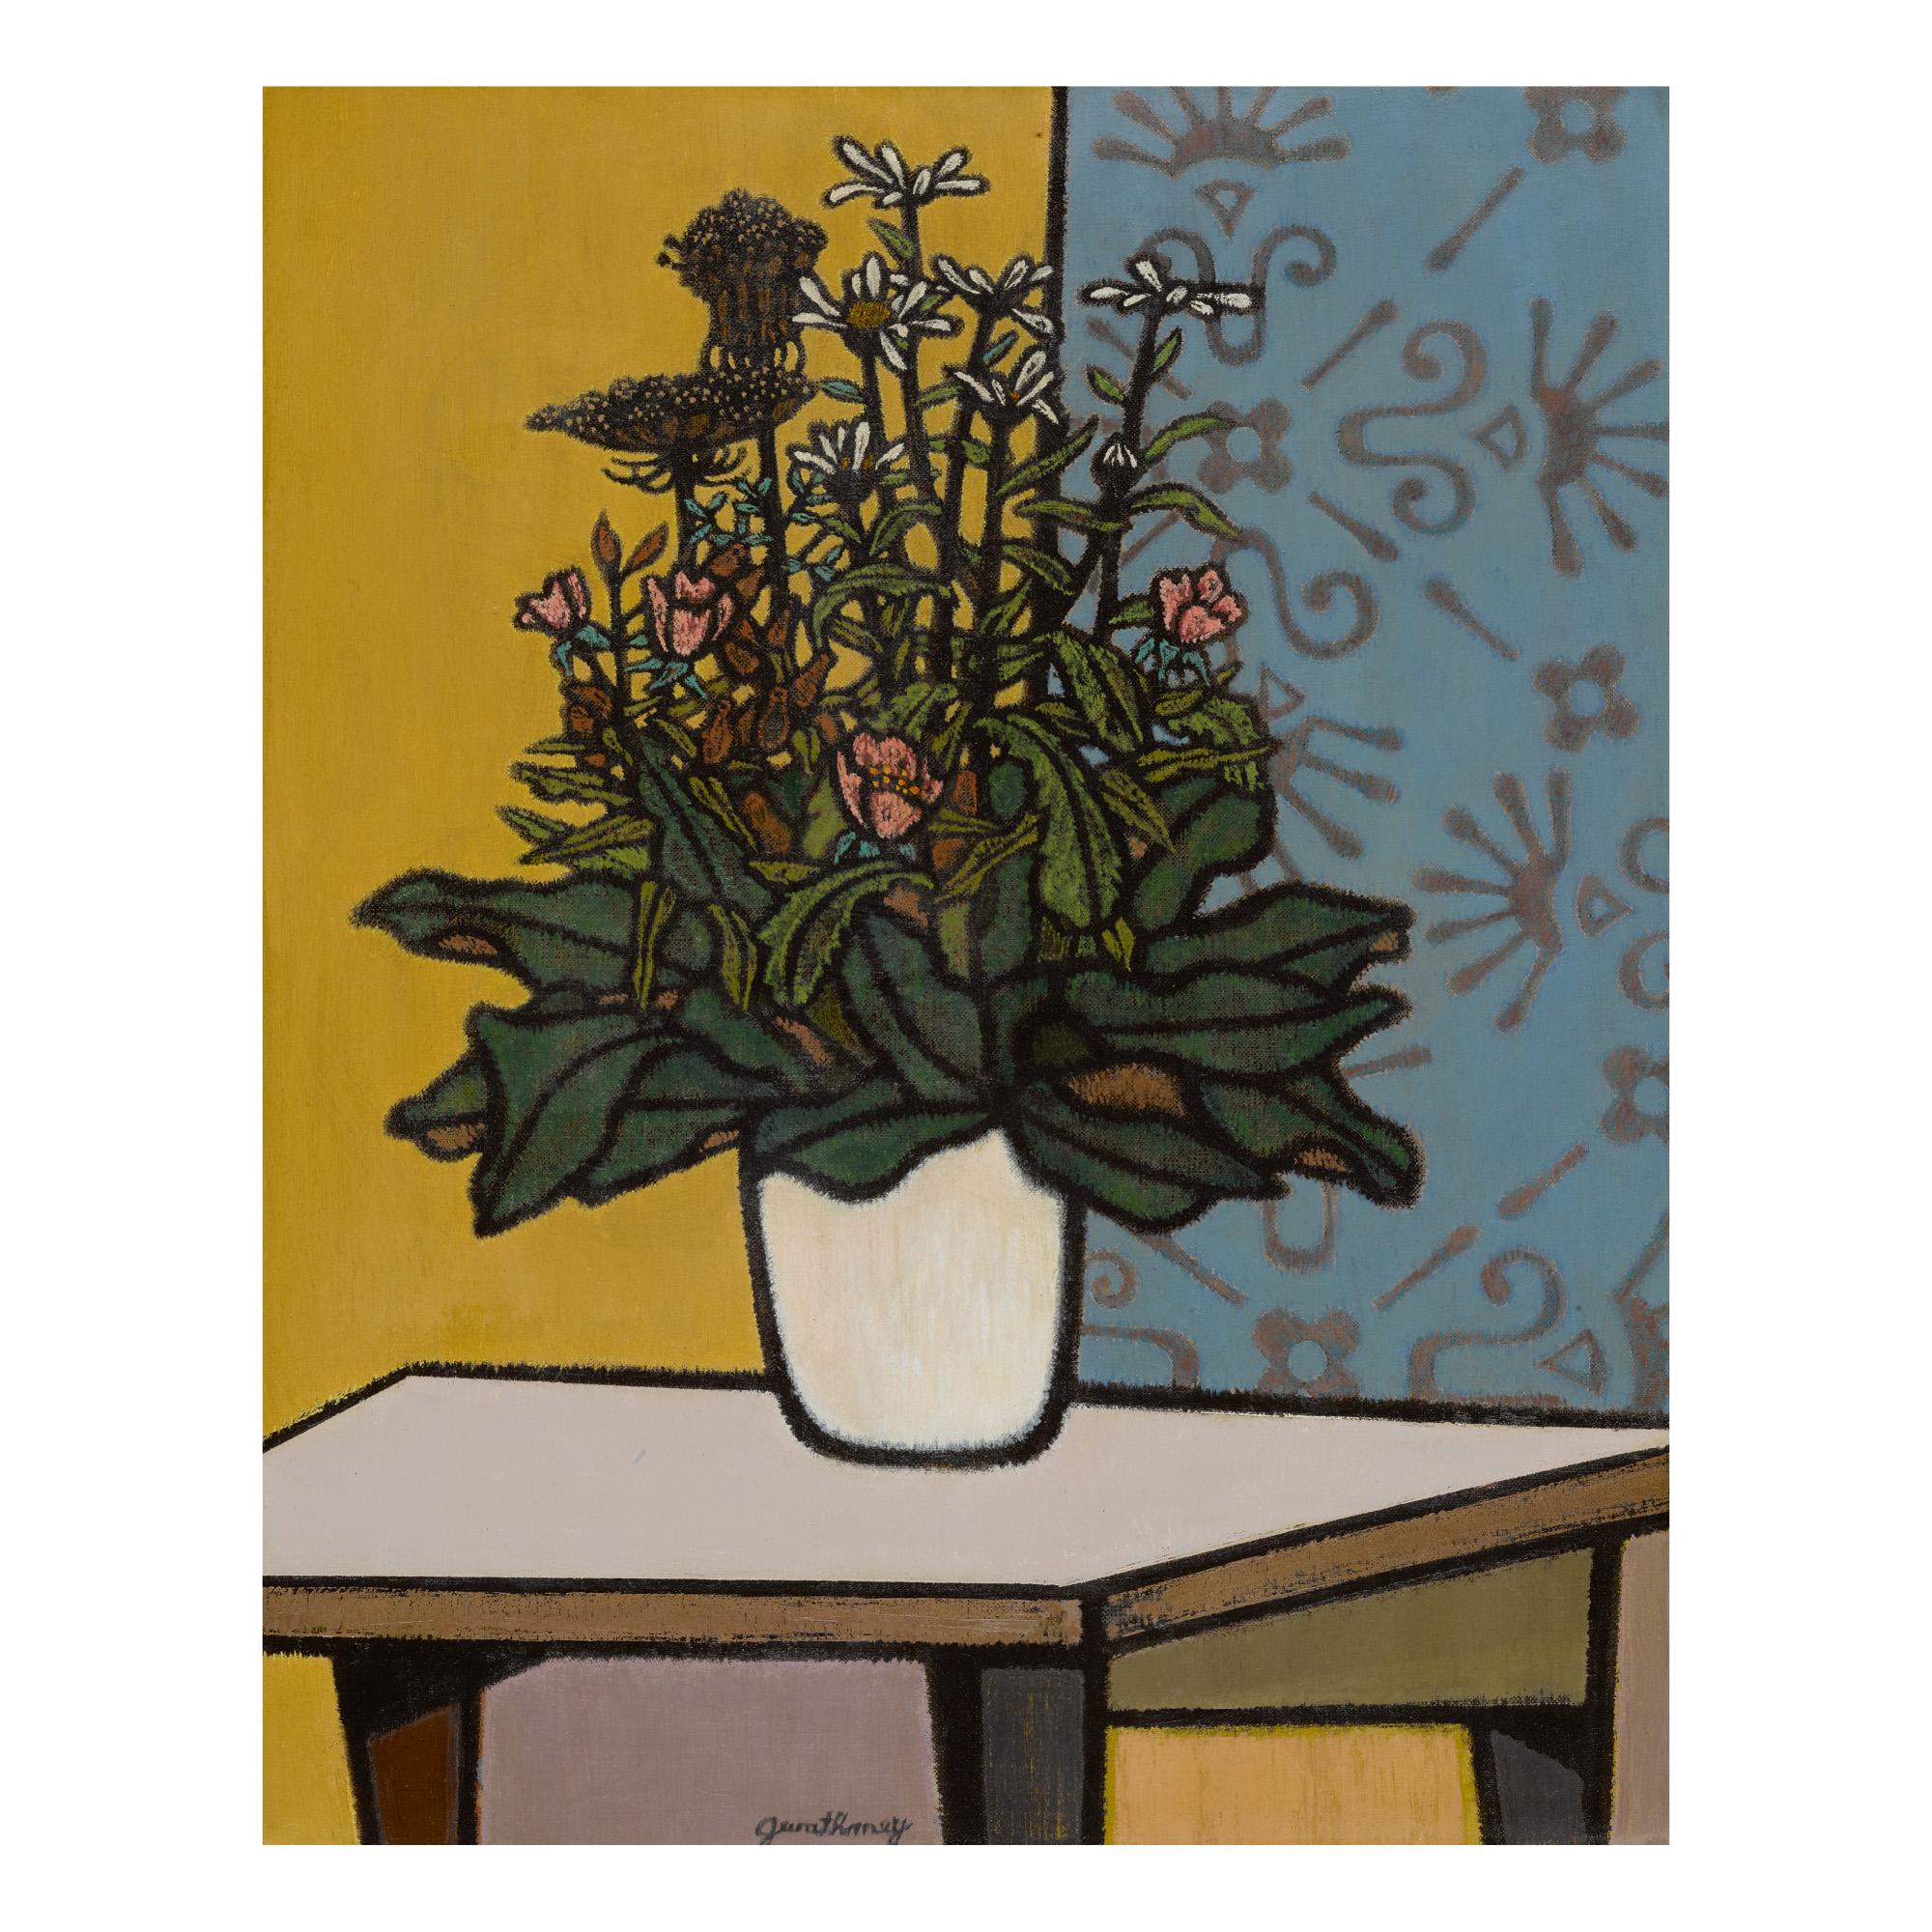 ROBERT GWATHMEY | FLOWERS FOR THE PULPIT